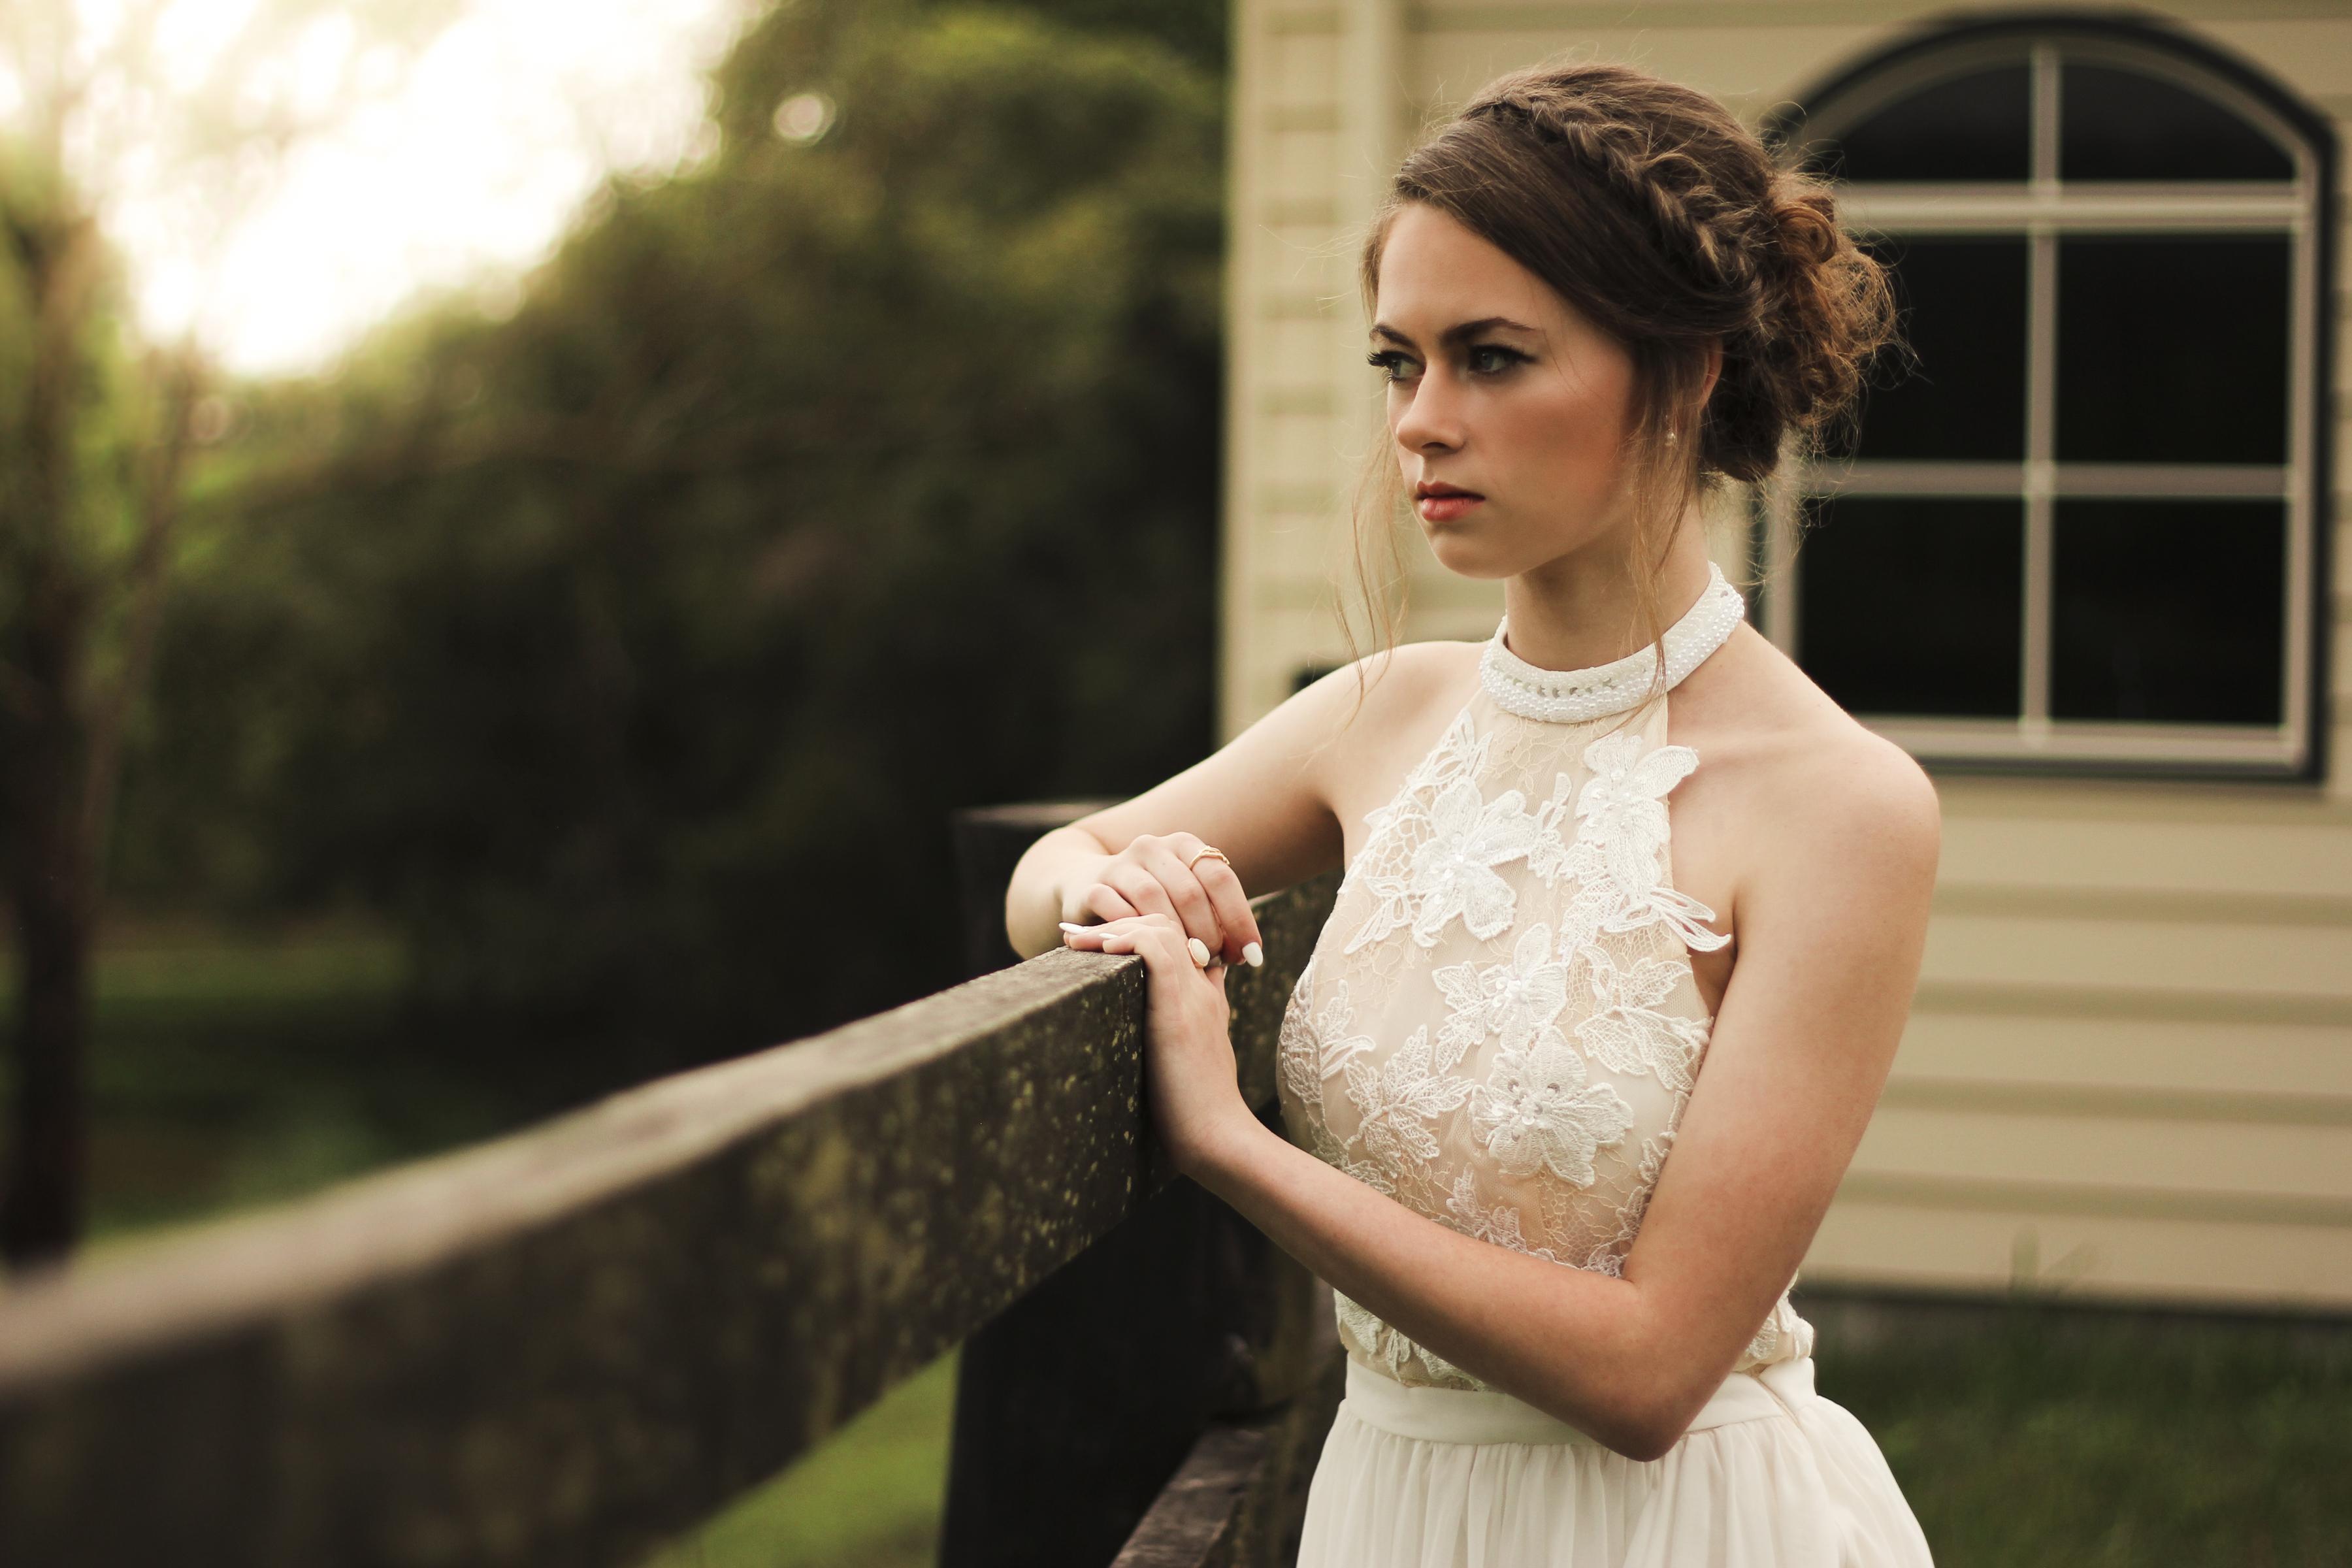 https://sleeklens.com/wp-content/uploads/2018/09/wedding-lightroom-presets-signature-bride-groom-after-8.jpg